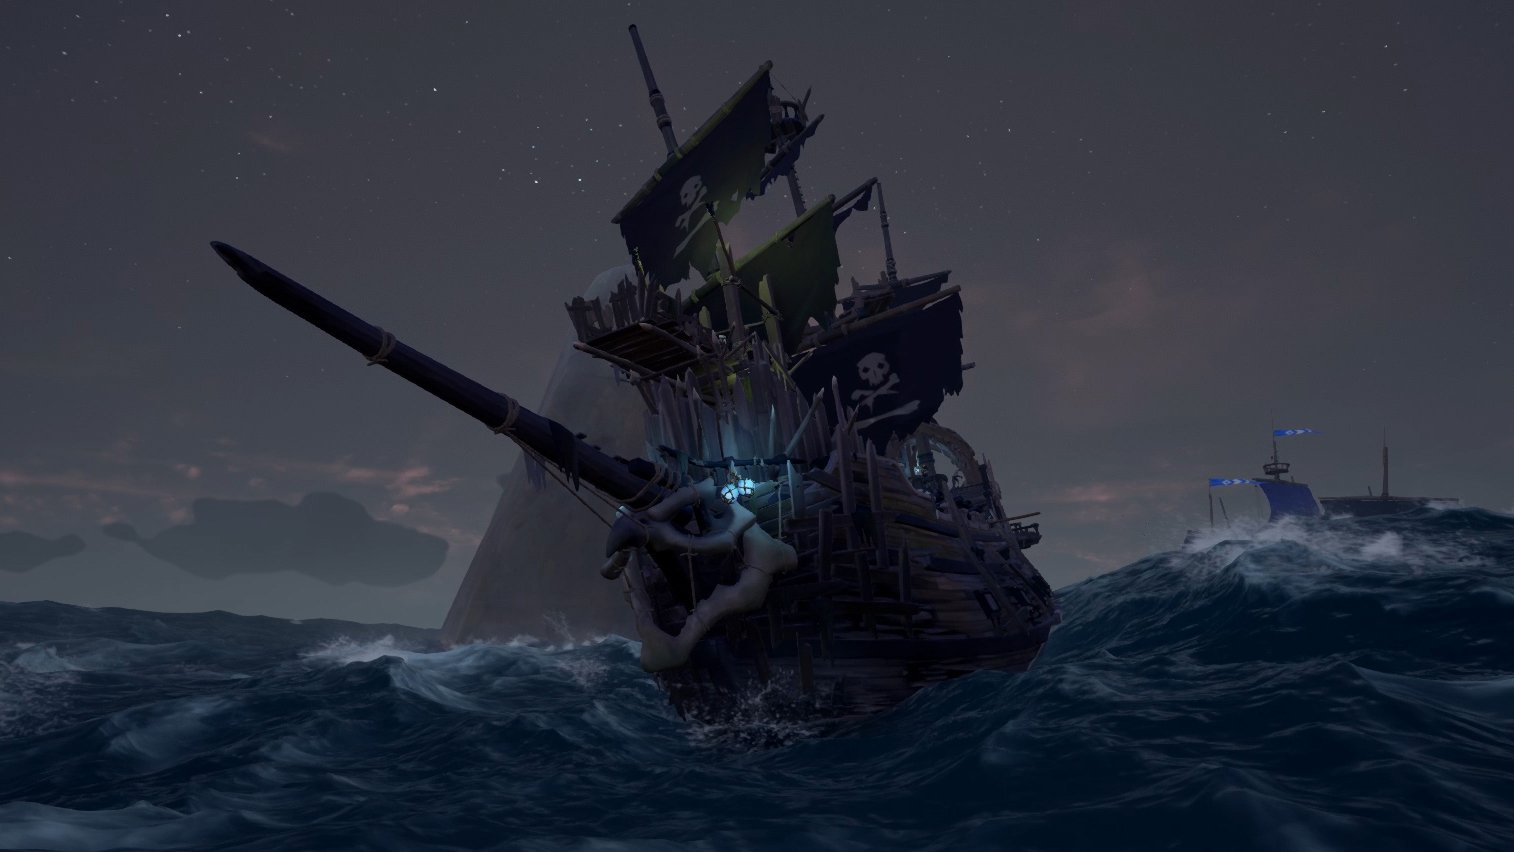 How to Kill Skeleton Ships in Sea of Thieves   Shacknews